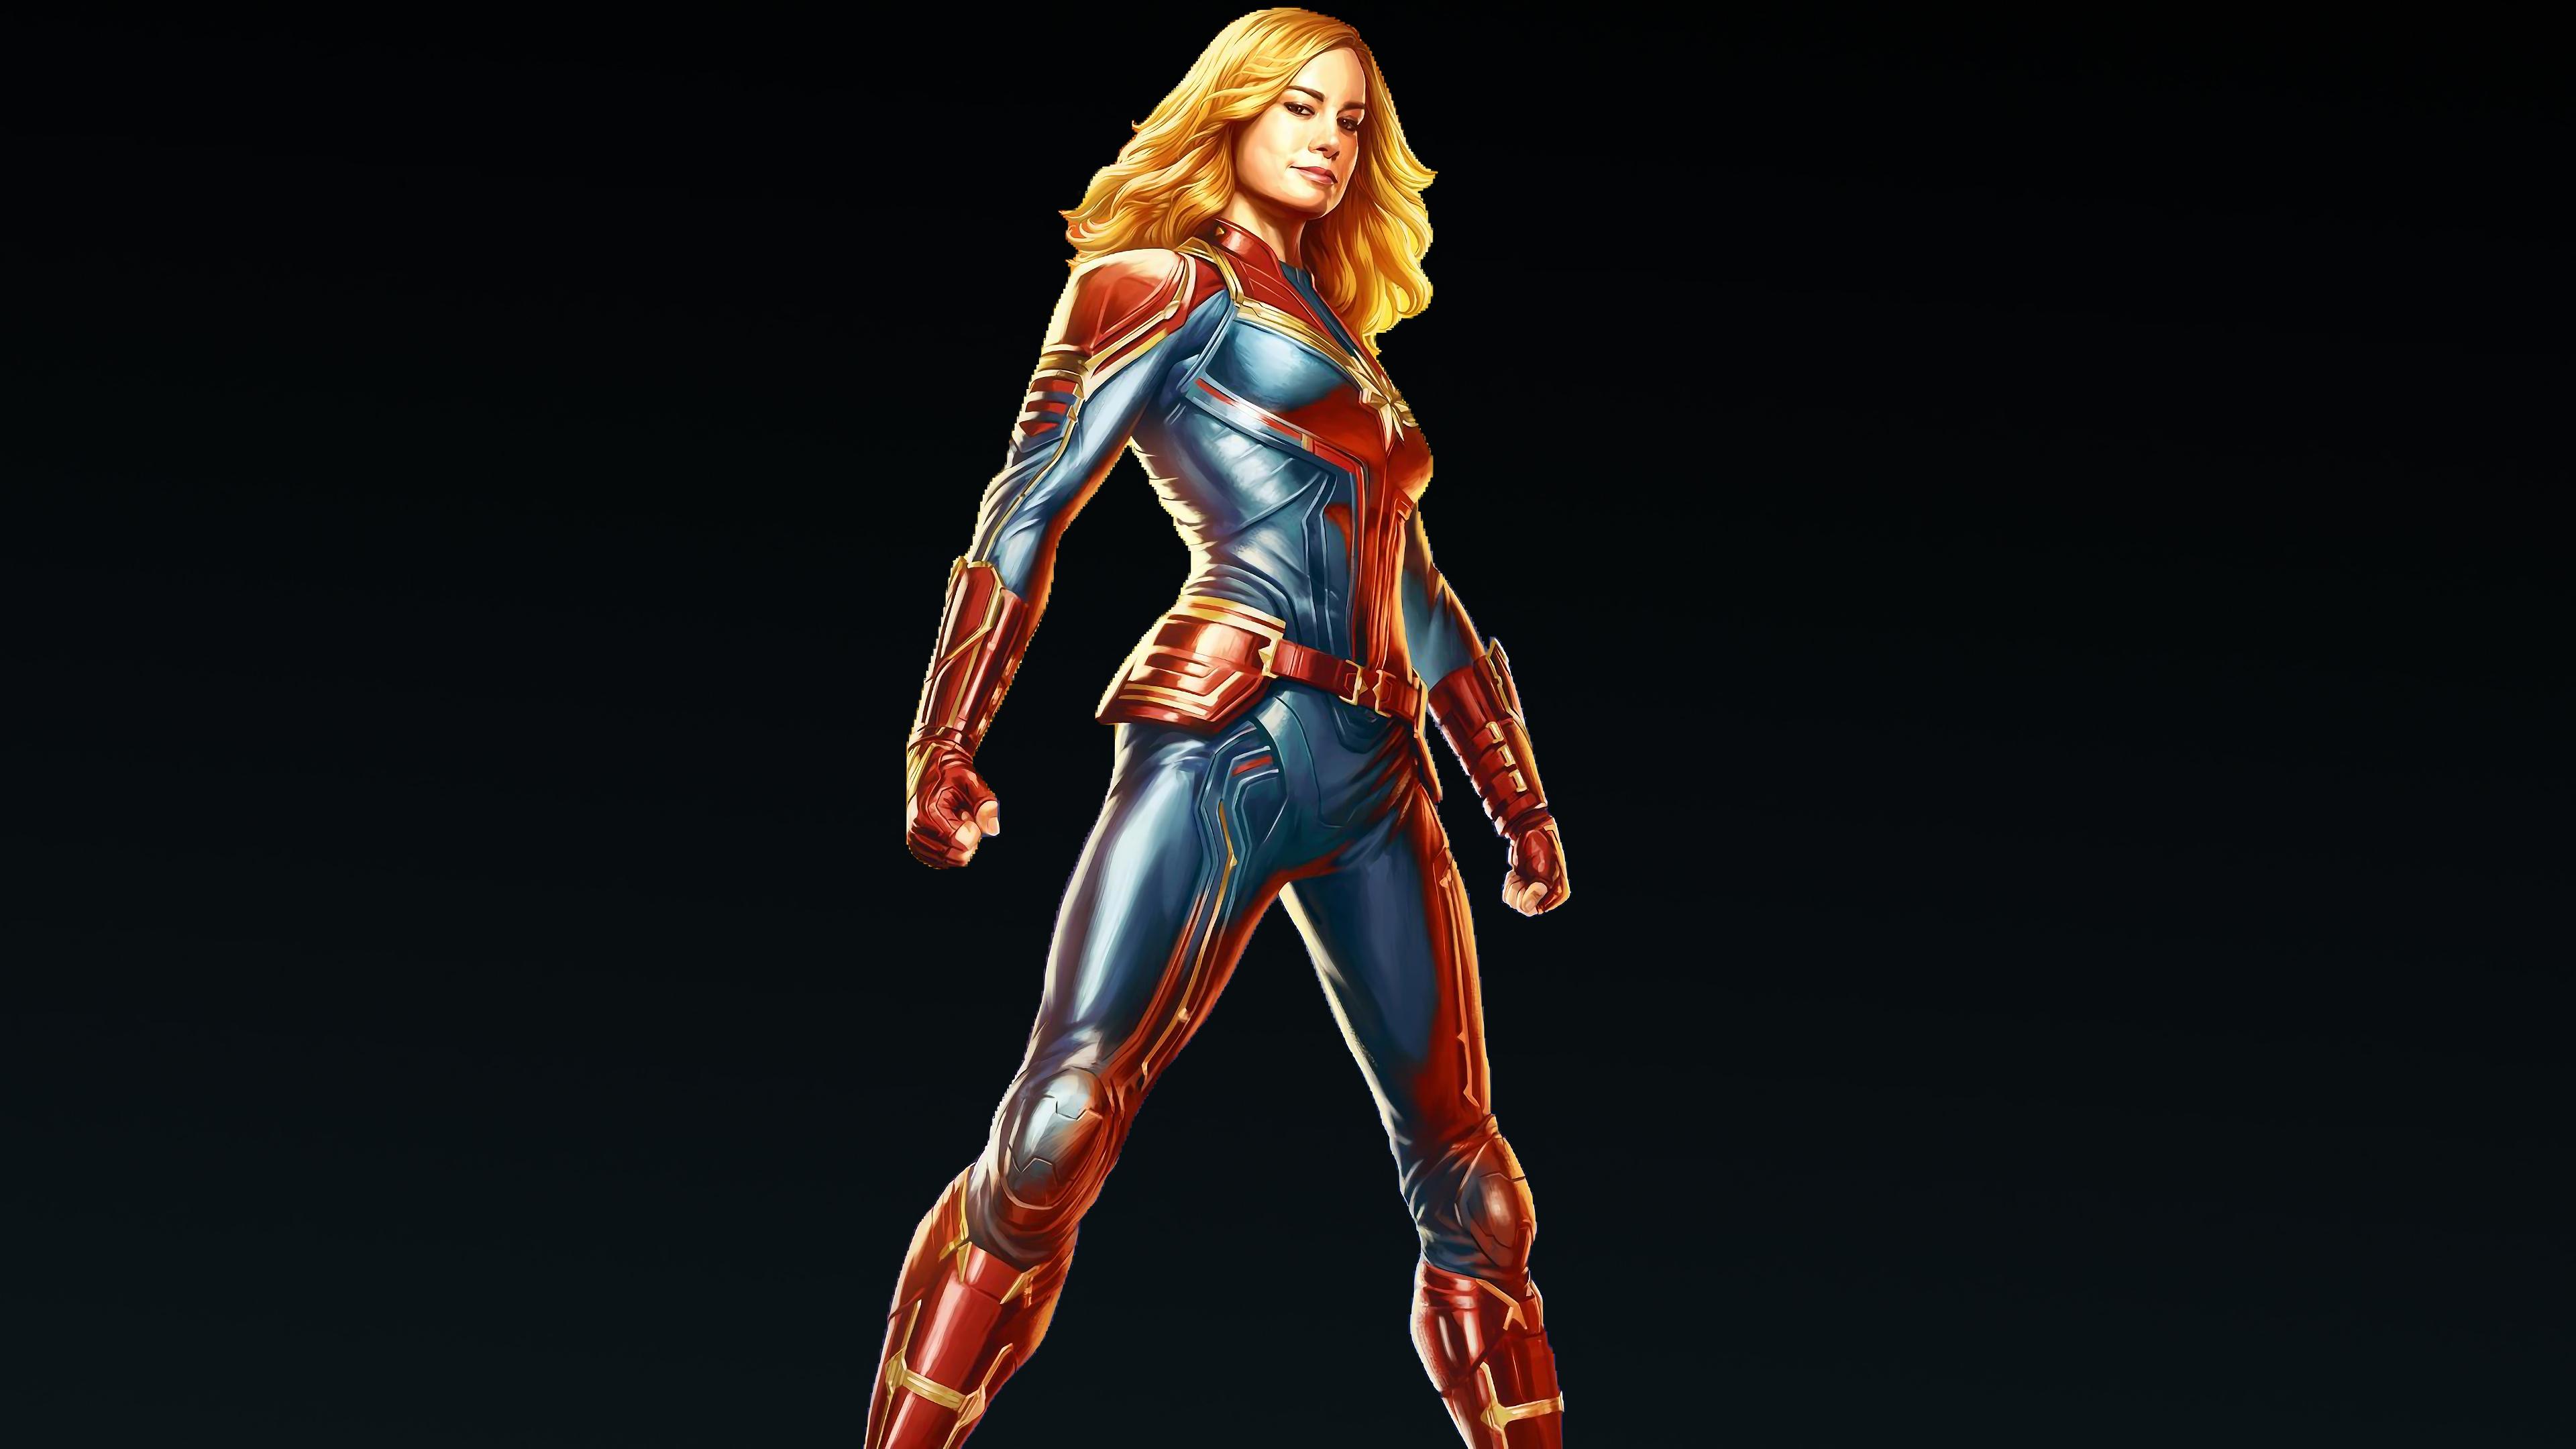 Wallpaper 4k Captain Marvel Movie 2019 Carol Danvers 4k Wallpaper